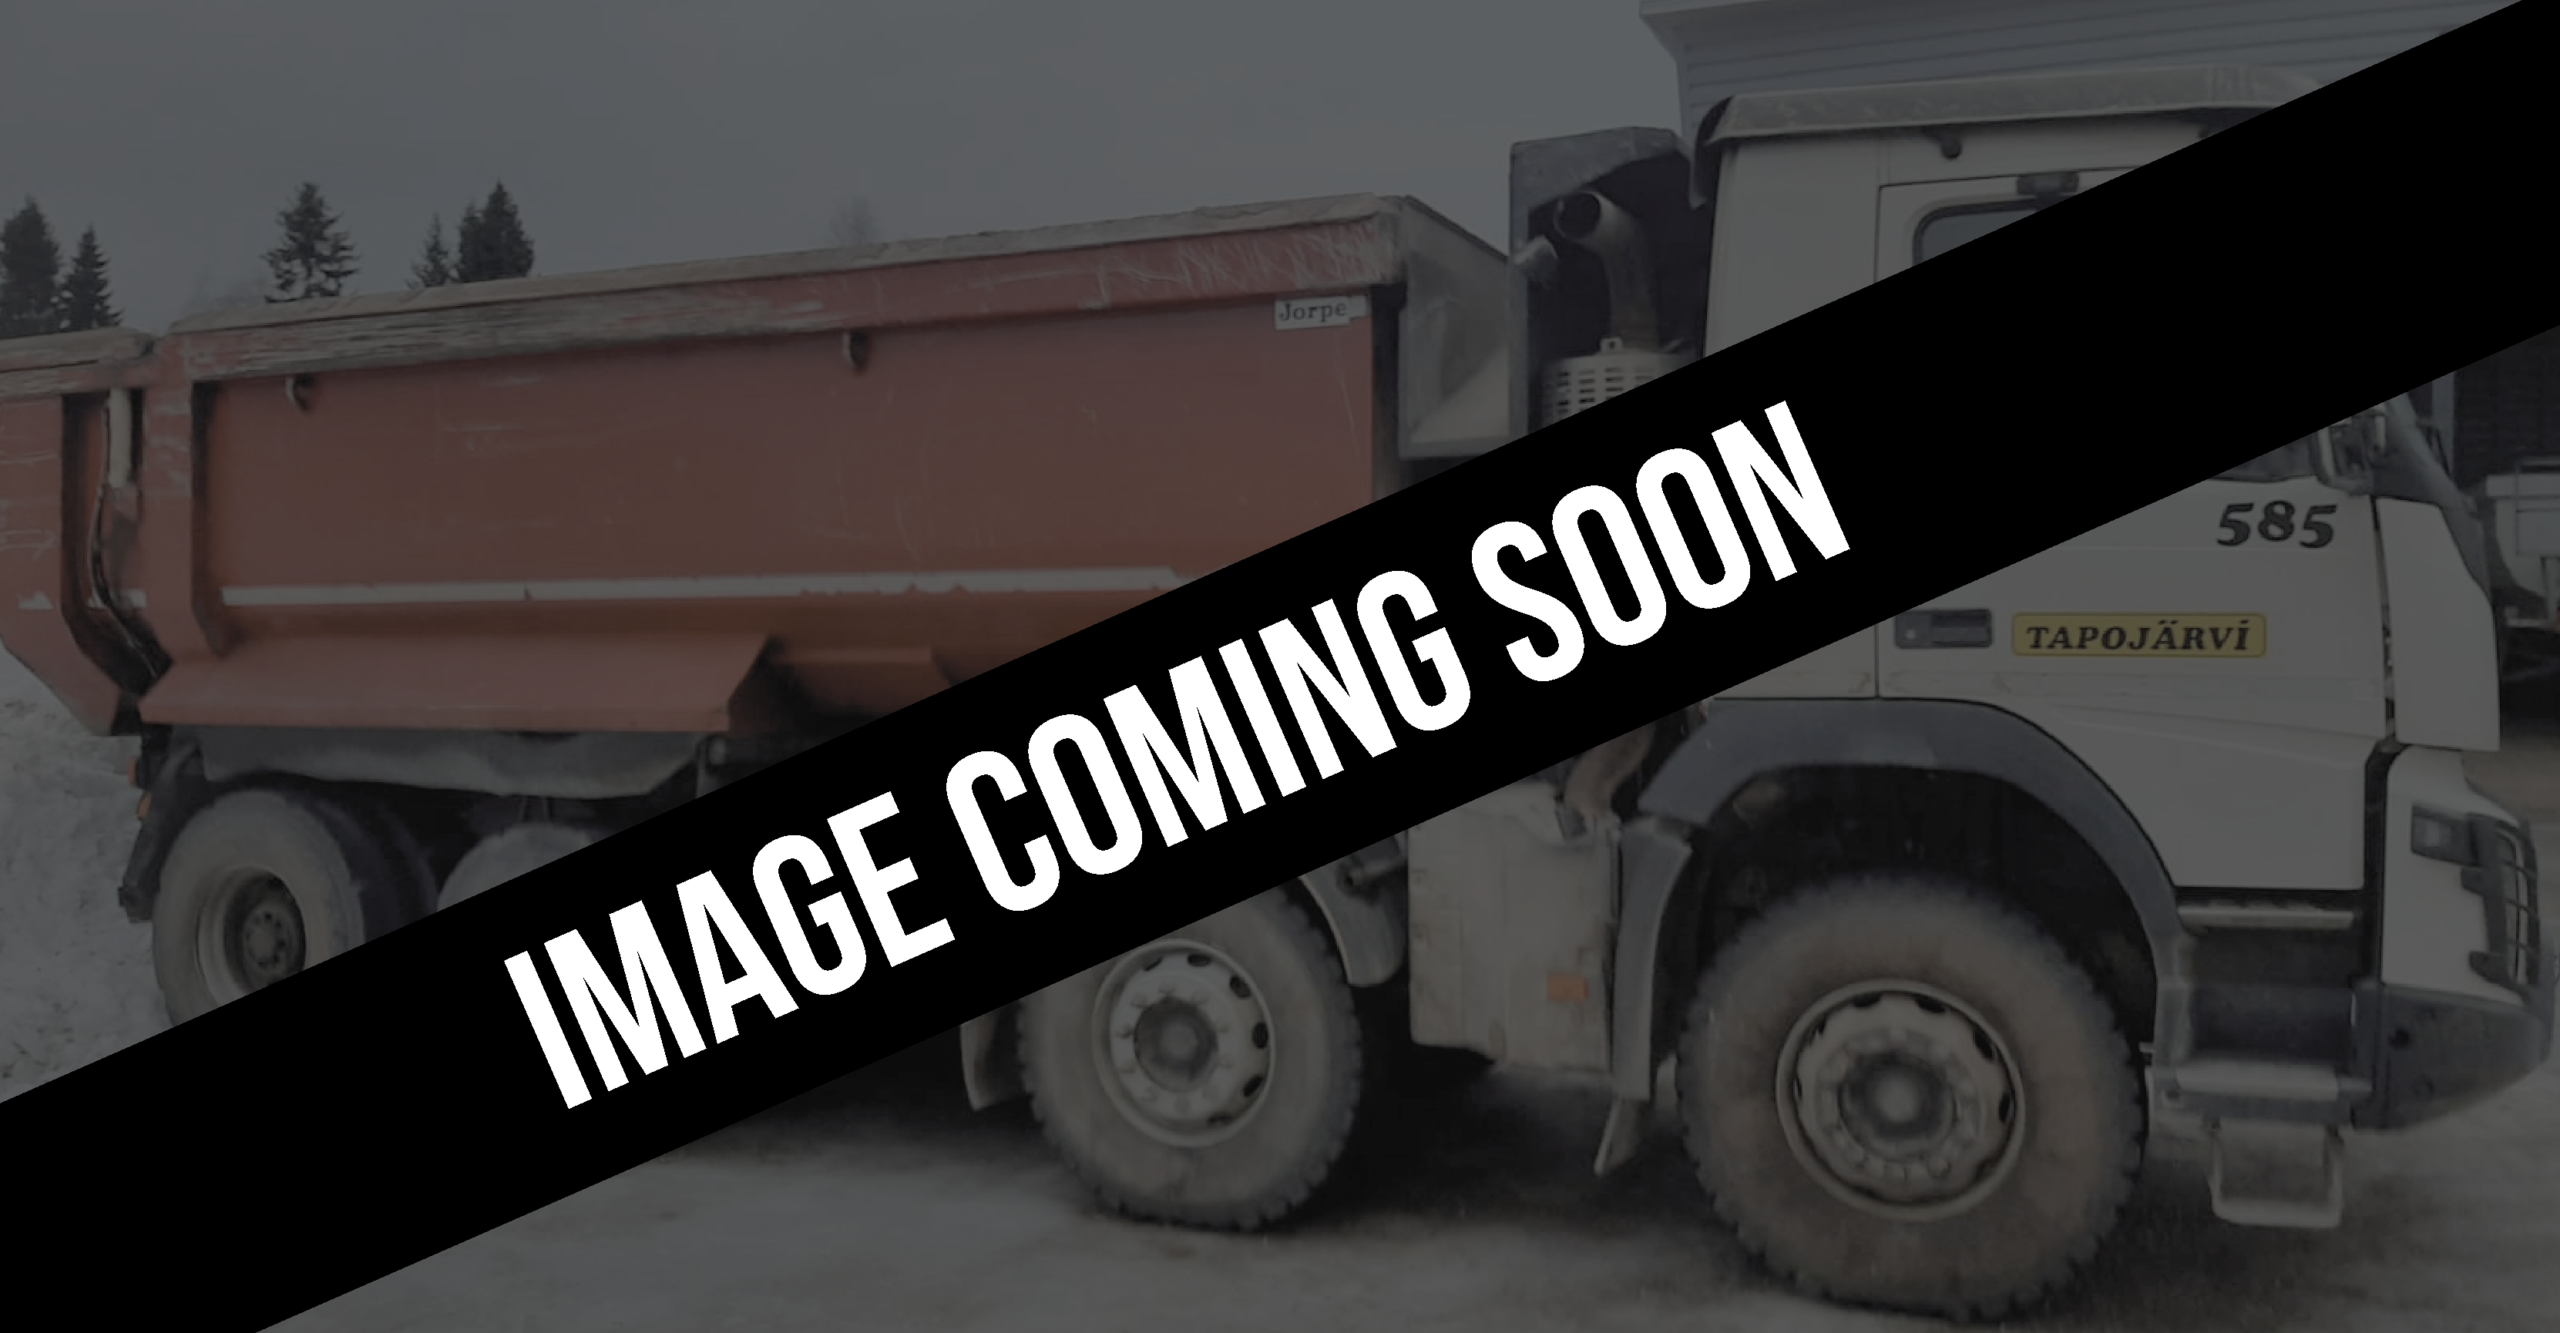 Image-coming-soon-2-kopio-aspect-ratio-1440-750